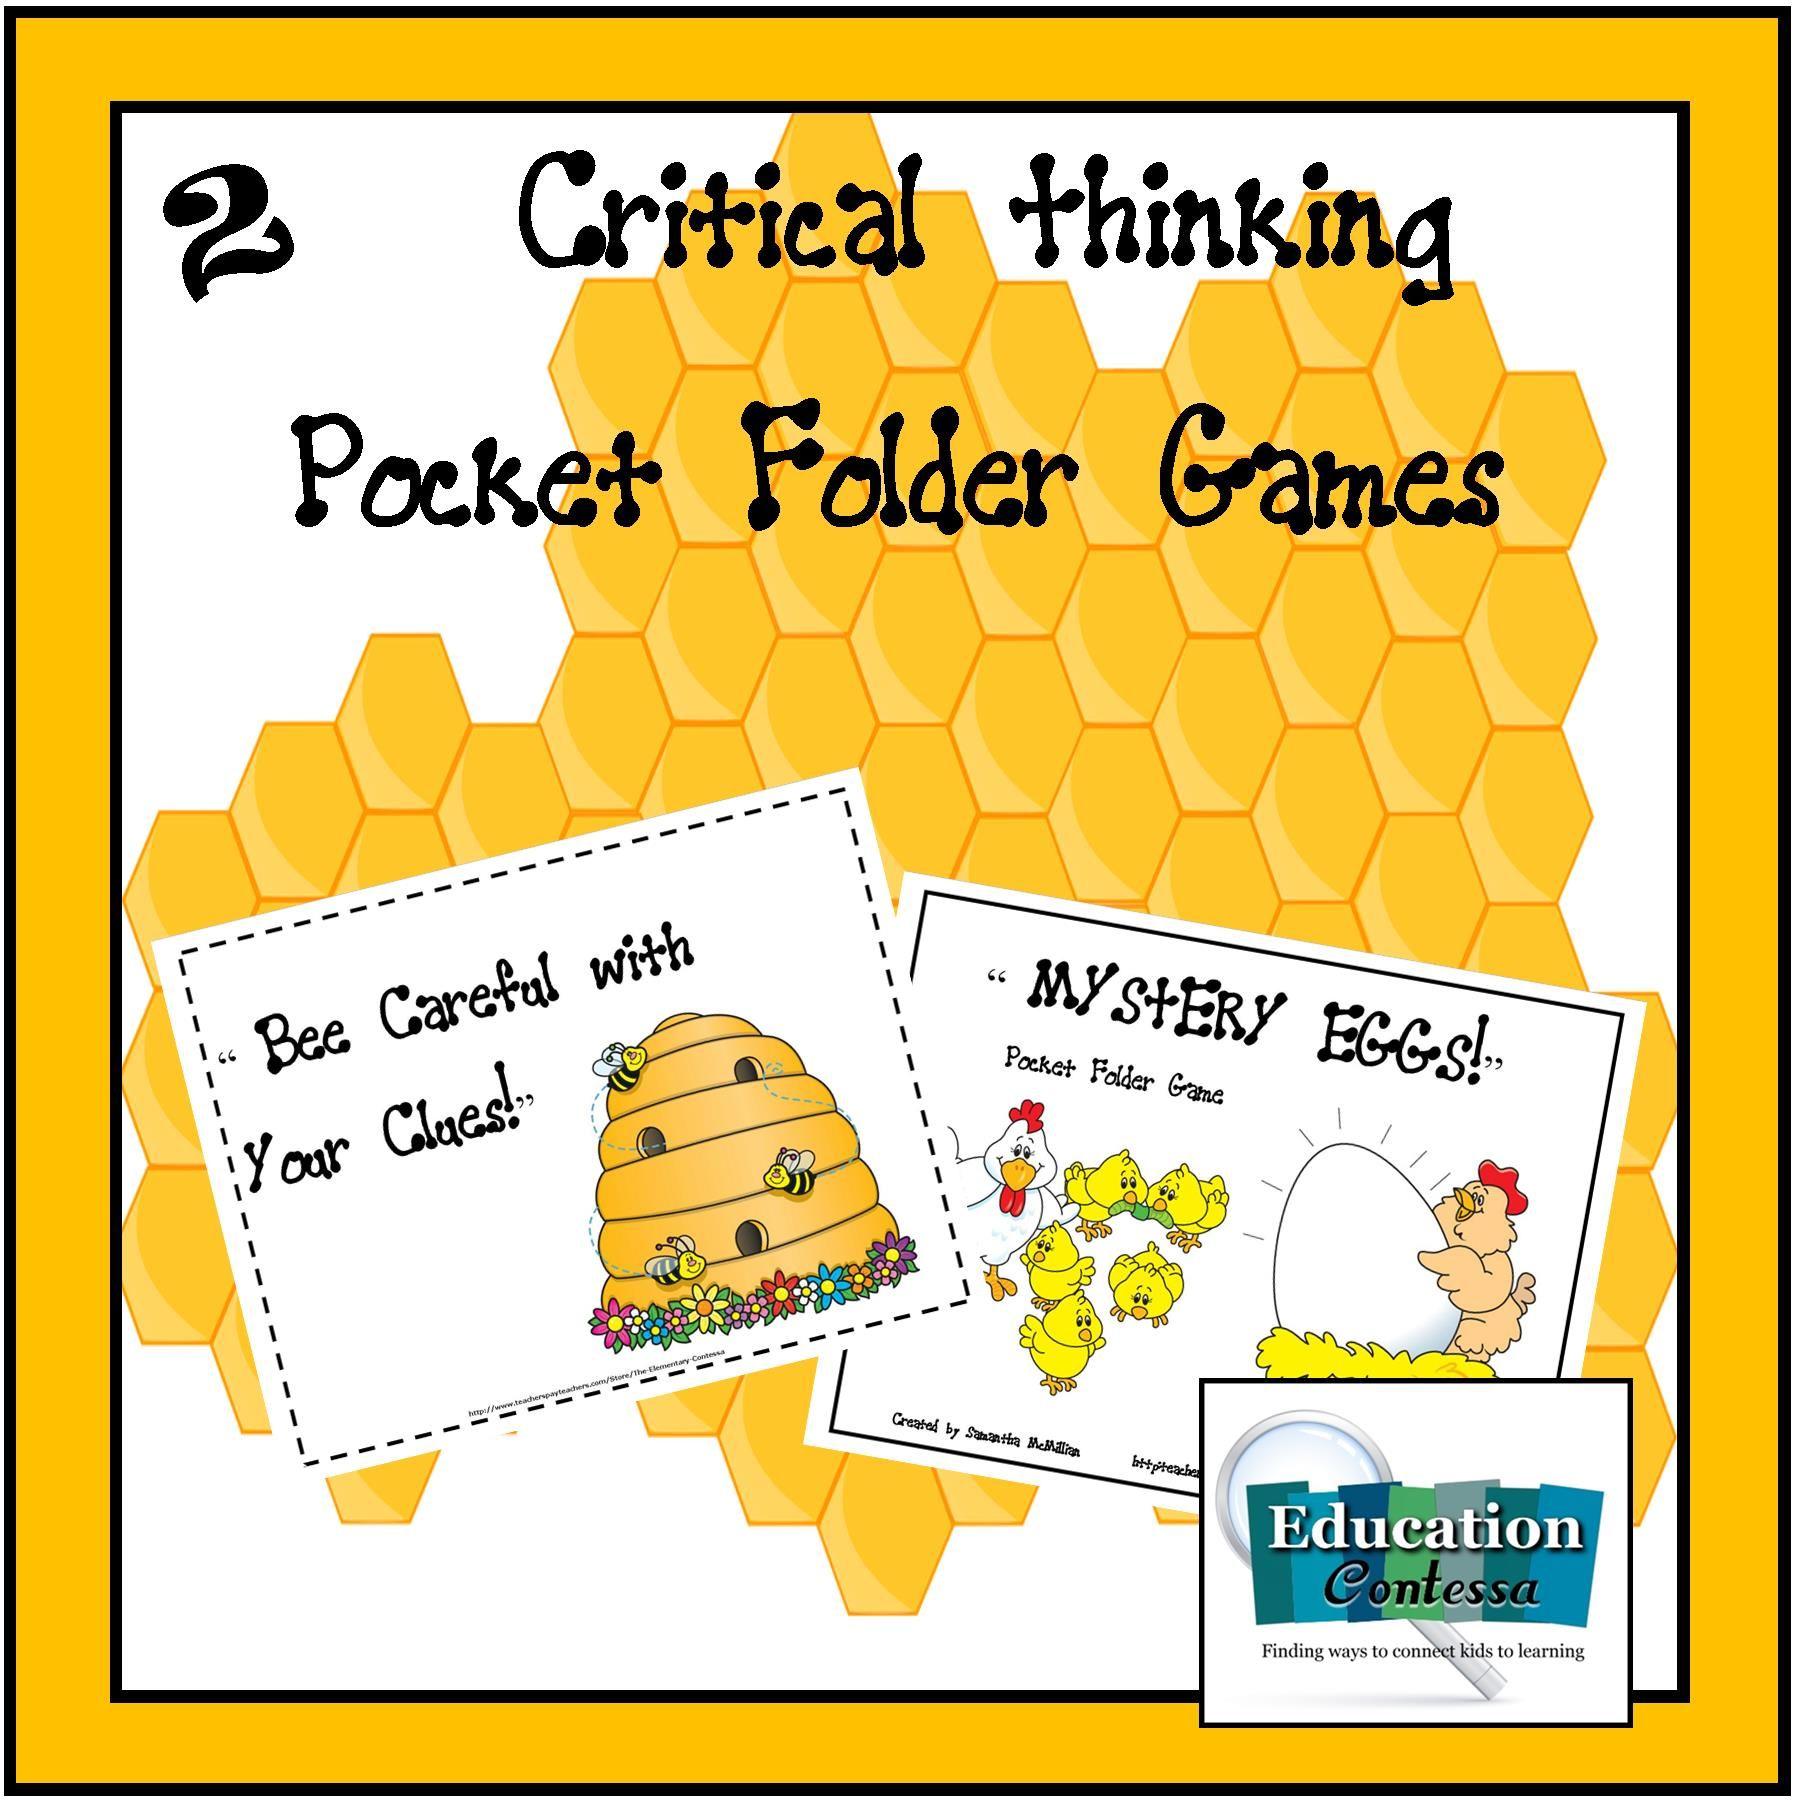 2 critical thinking pocket folder games for balanced